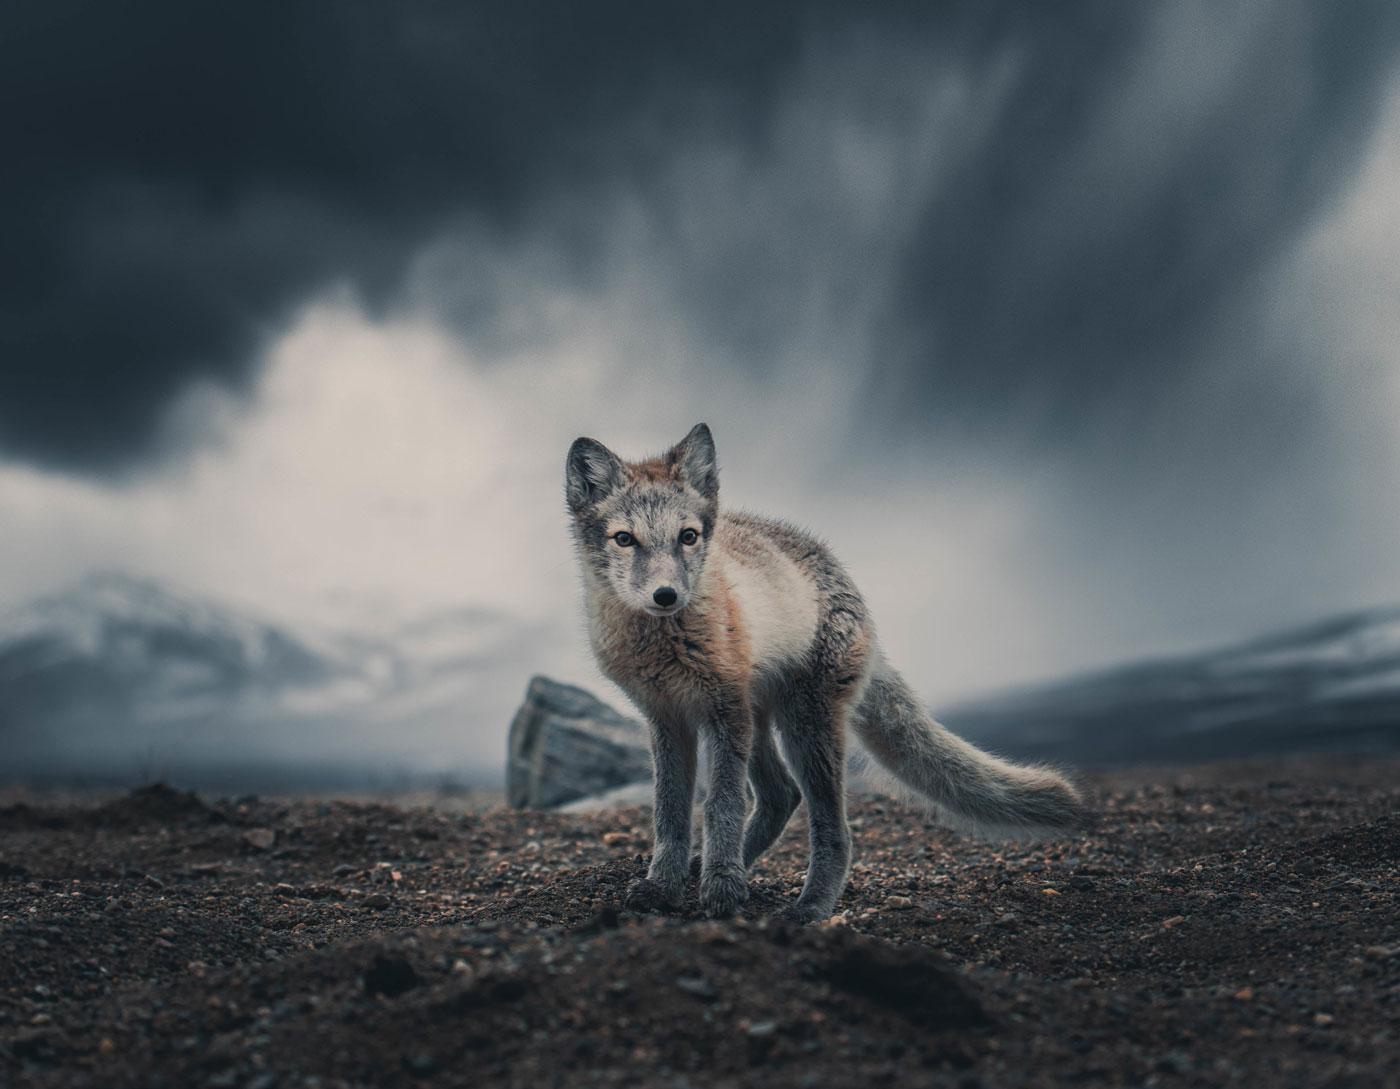 Photography wildlife ©Konsta Punkka